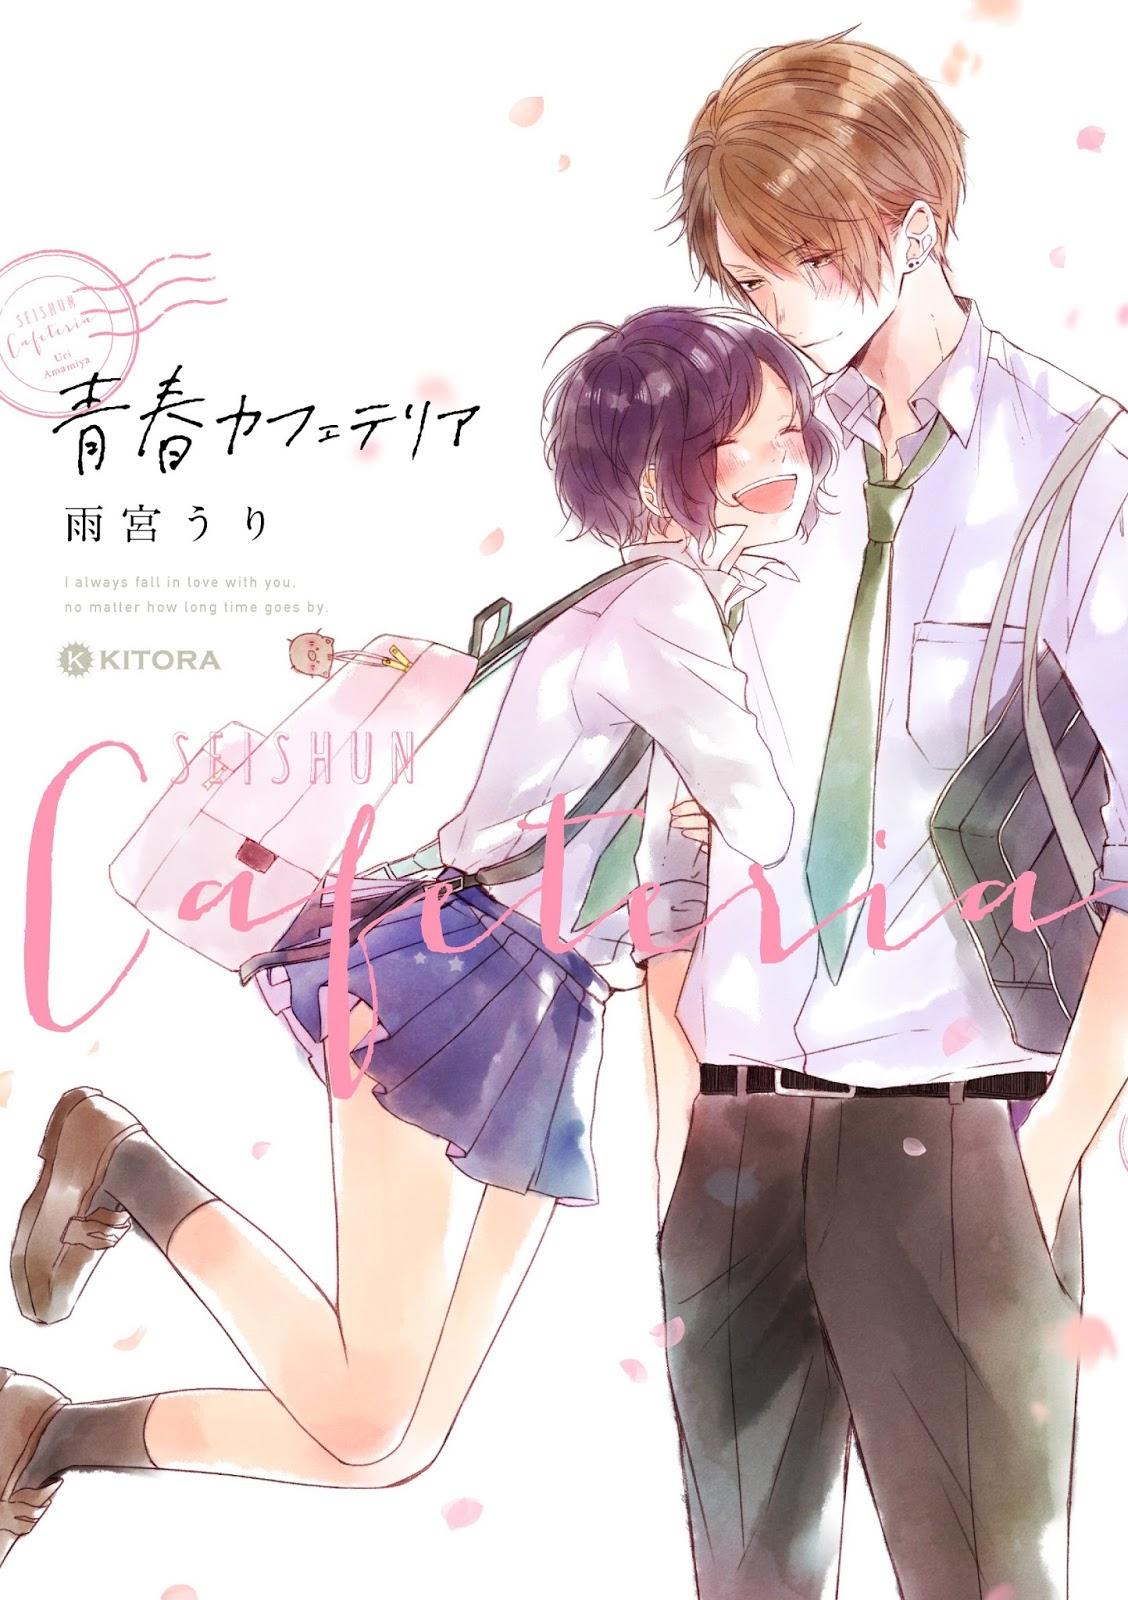 Seishun Cafeteria - Yuki x Hana